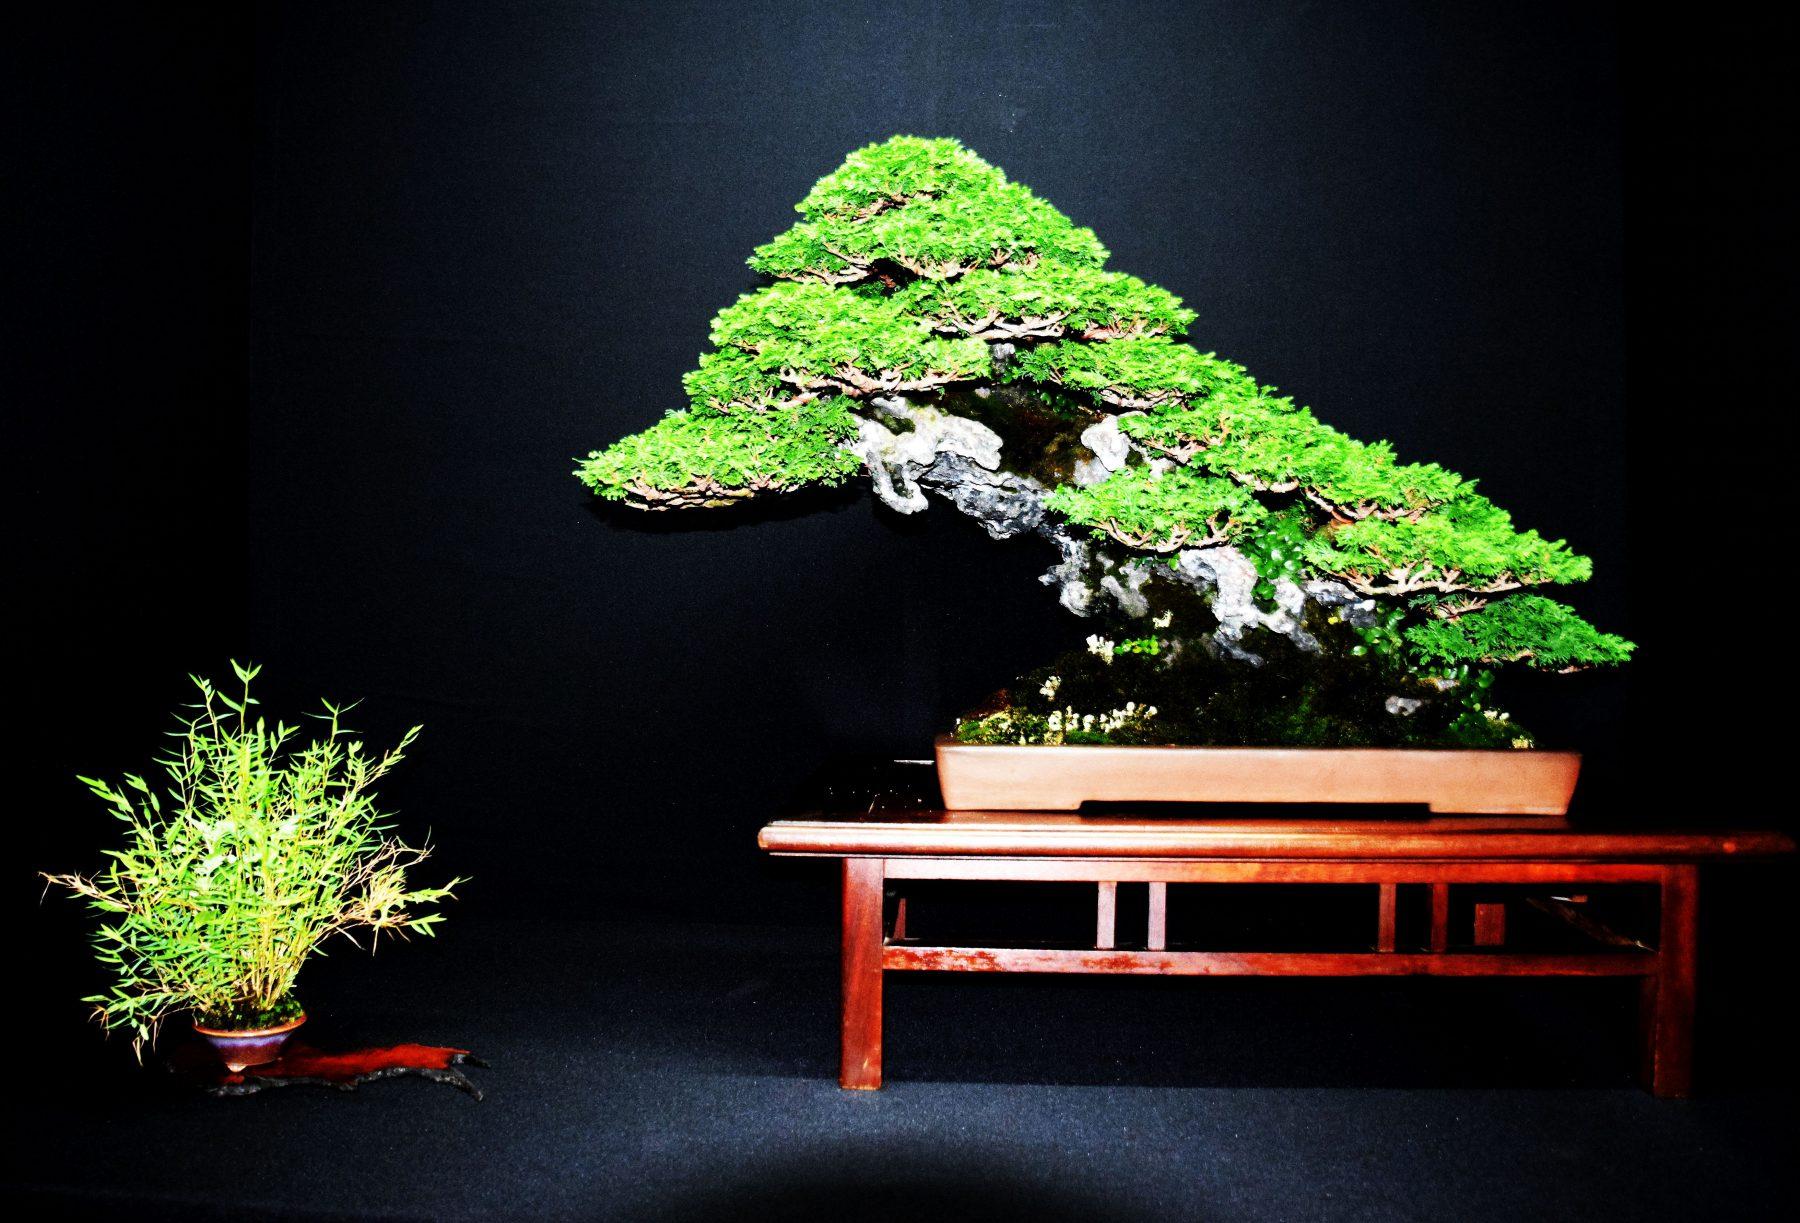 bonsai-museum-luis-vallejo-017